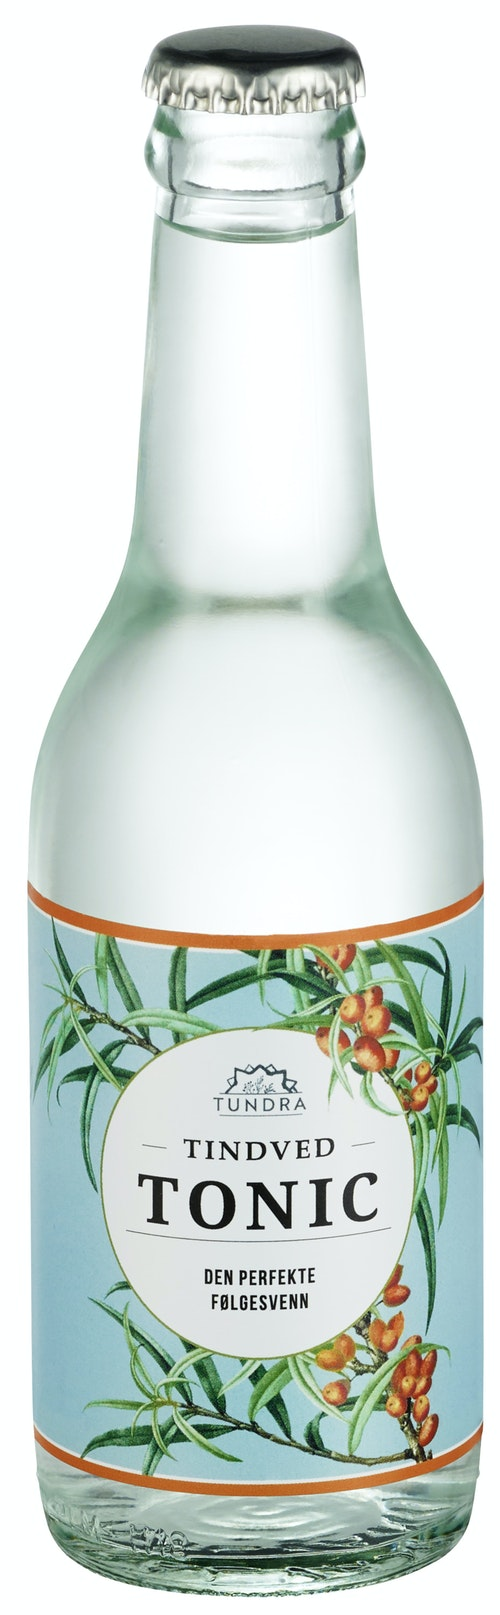 Tundra Tonic Tundra Tonic Water Tindved, 0,25 l